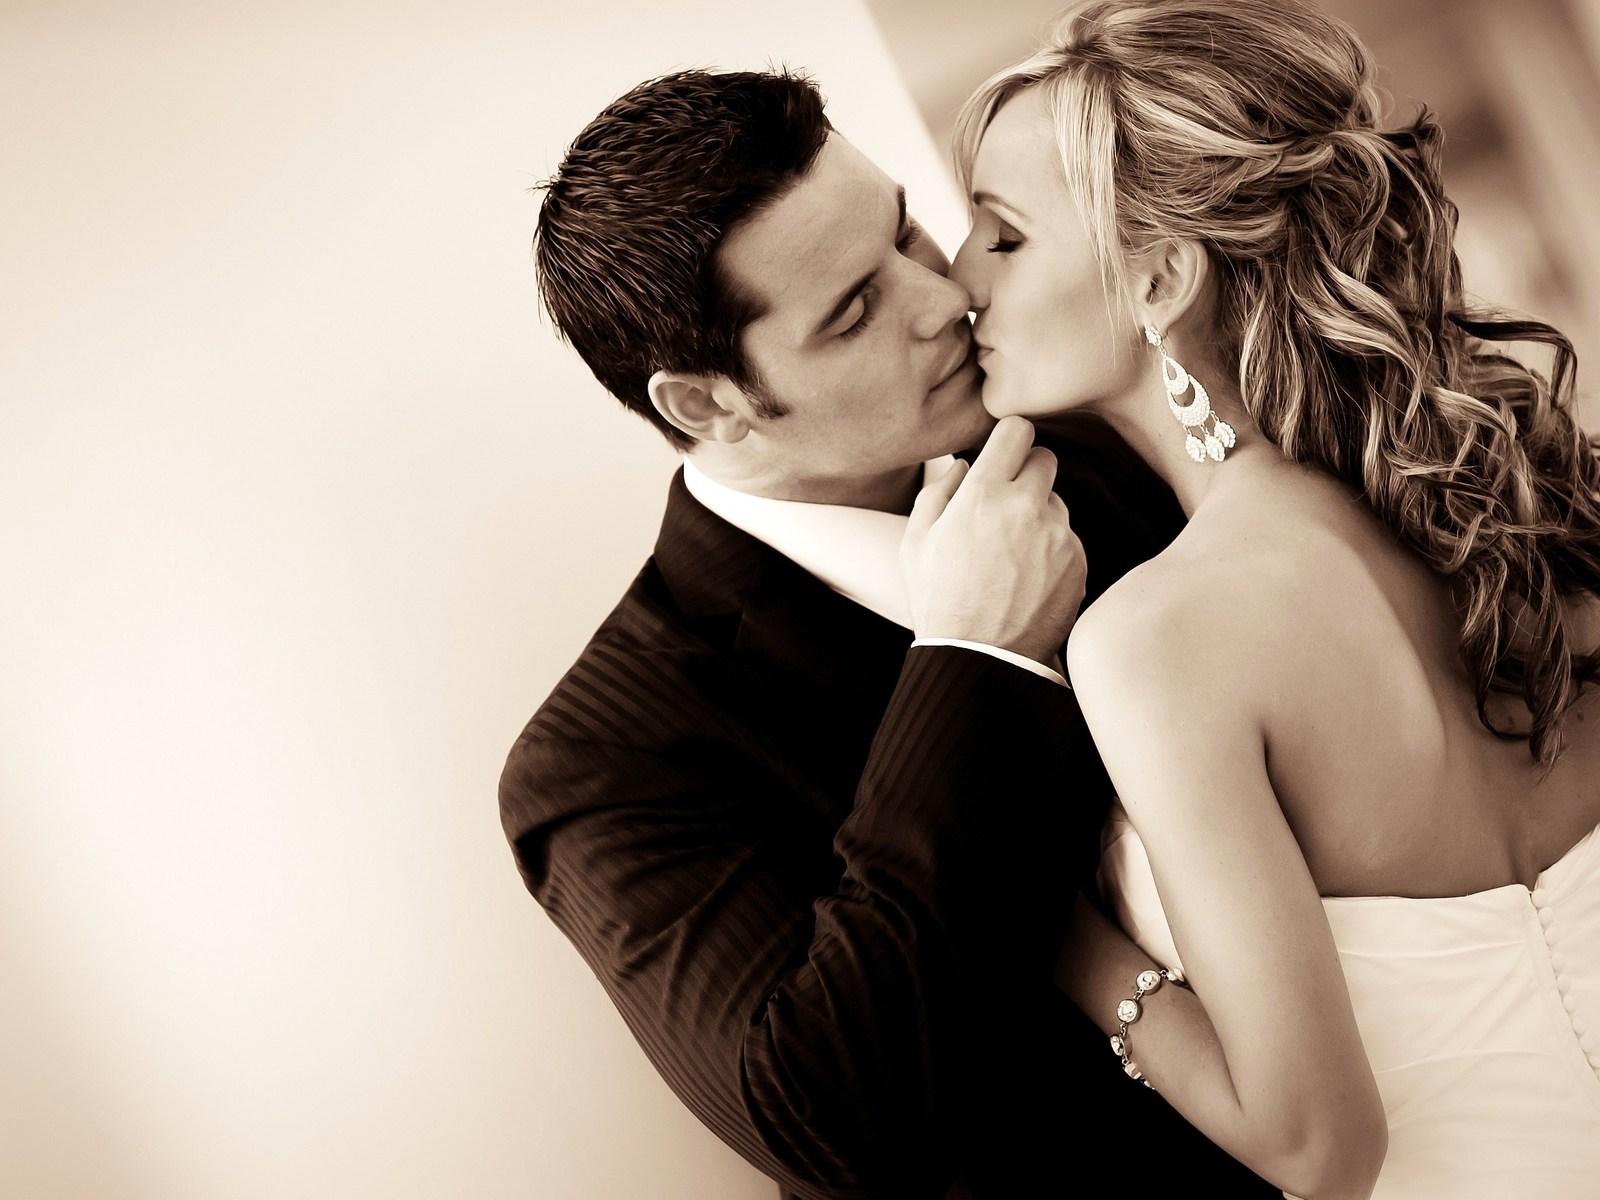 Фото замужних пар 16 фотография